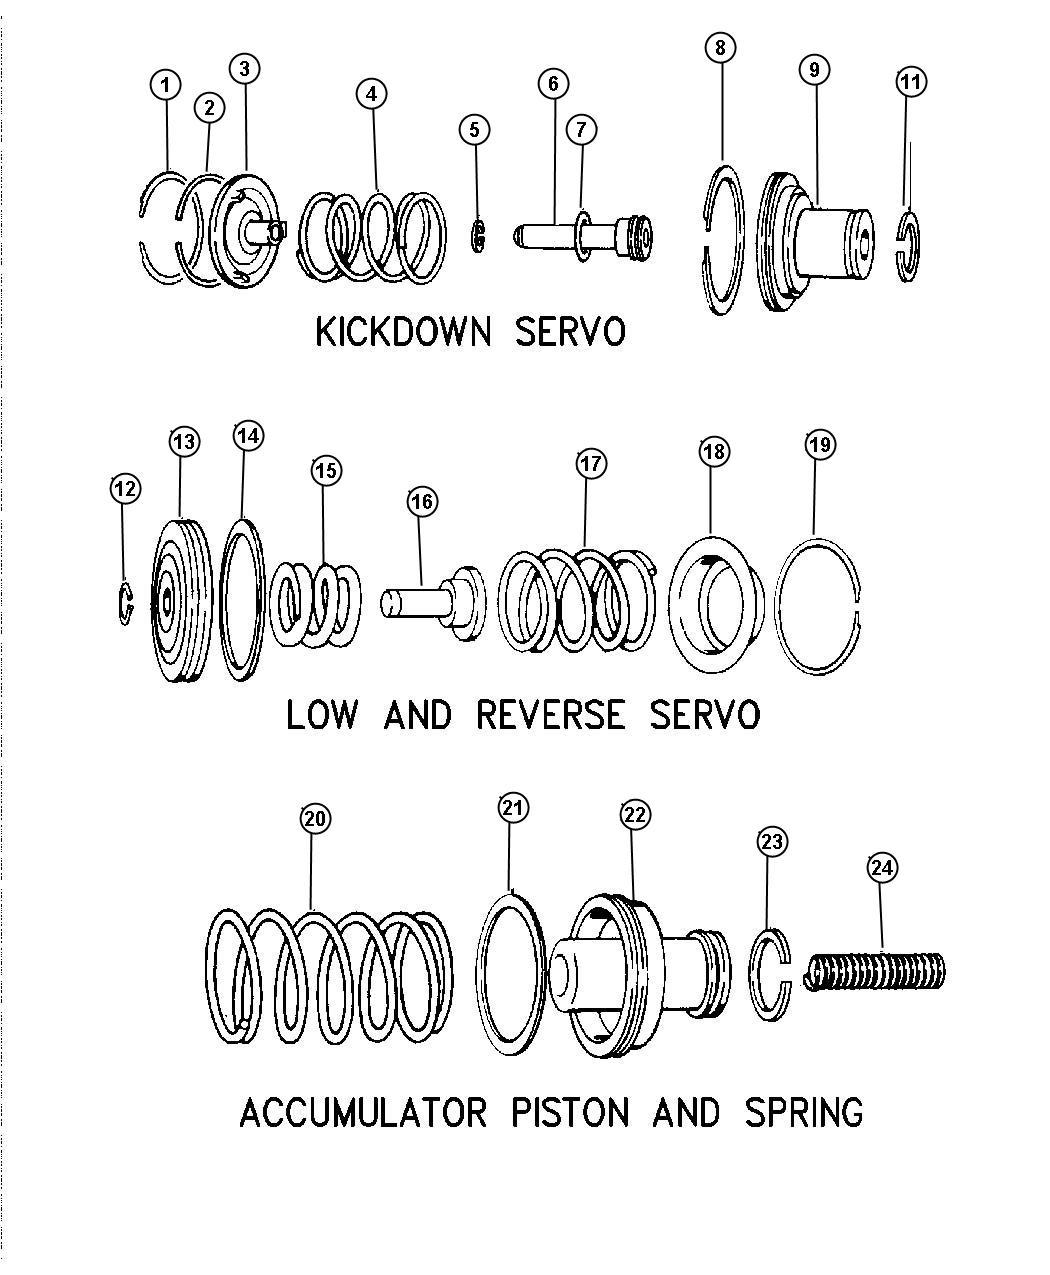 Servos, Accumulator Piston And Spring Automatic